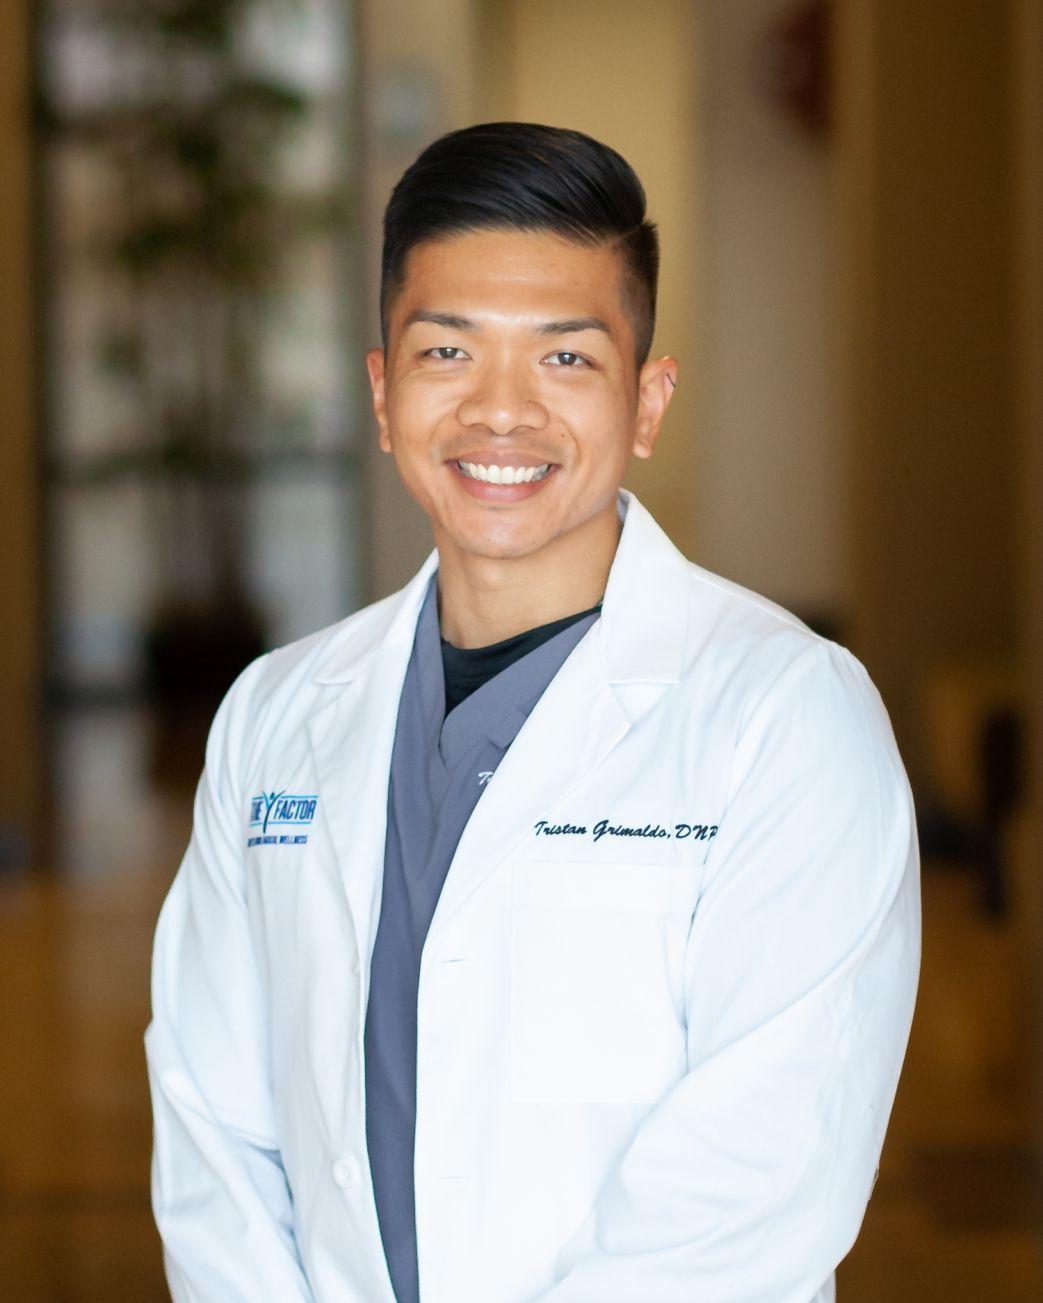 Dr. Tristan Grimaldo